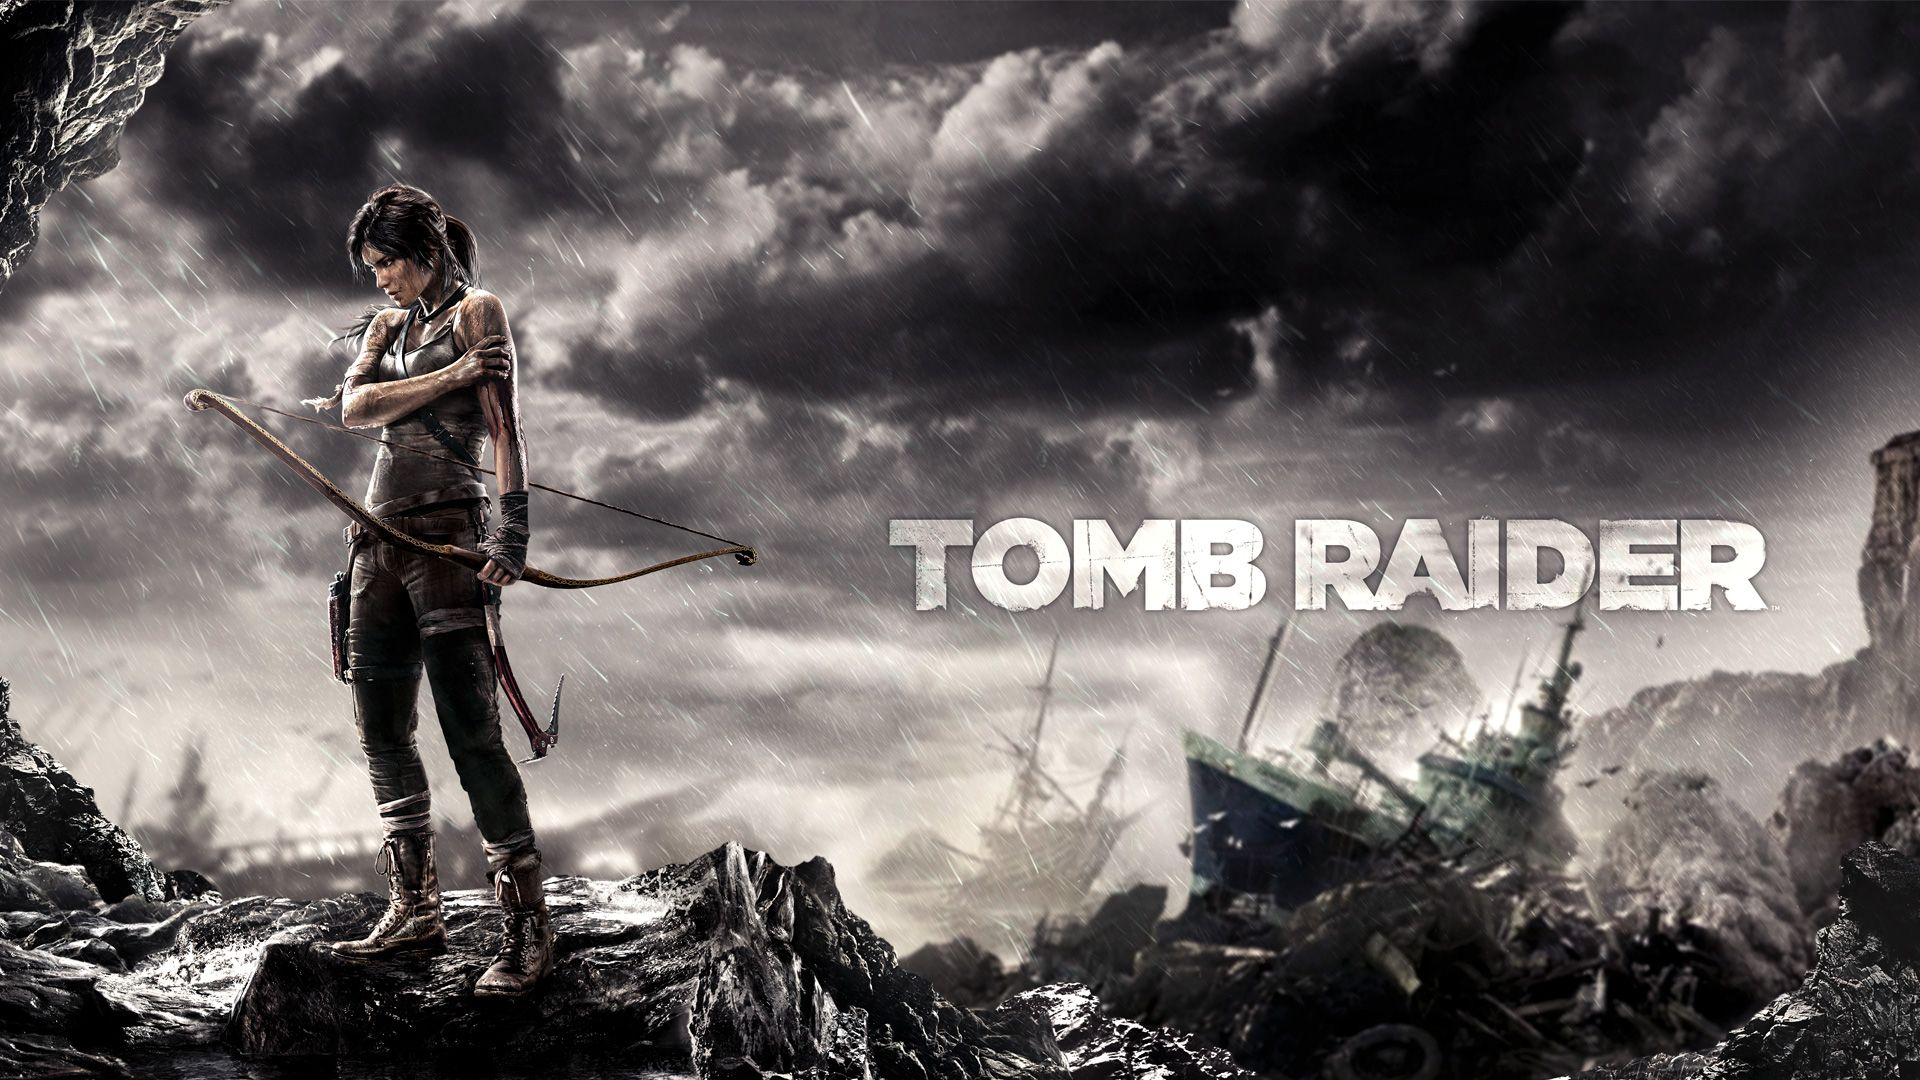 1920x1080 точек - tomb raider | Рисование. Фэнтези. | pinterest